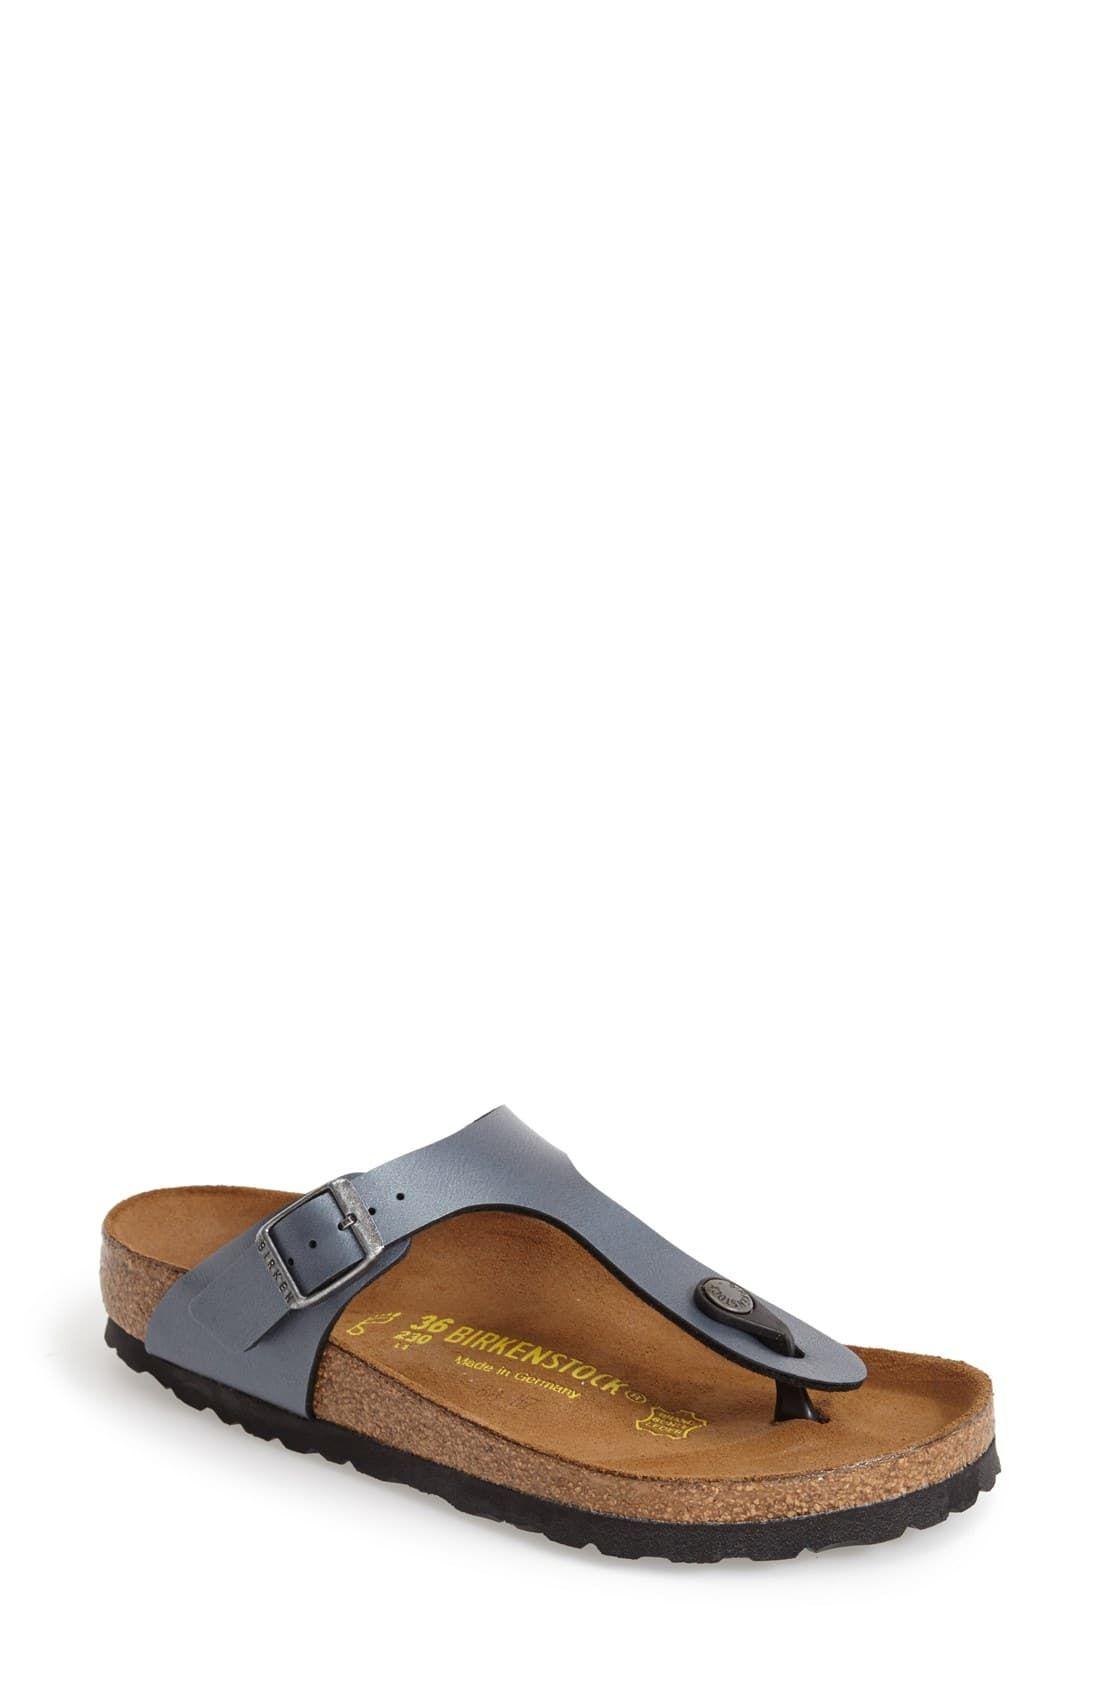 2014 New Leather Slippers Birkenstock Gizeh Women Flat Sandals Platformfor Cheap Flip Flops Gladiator Cork Sandals Red Wedges Summer Shoes From